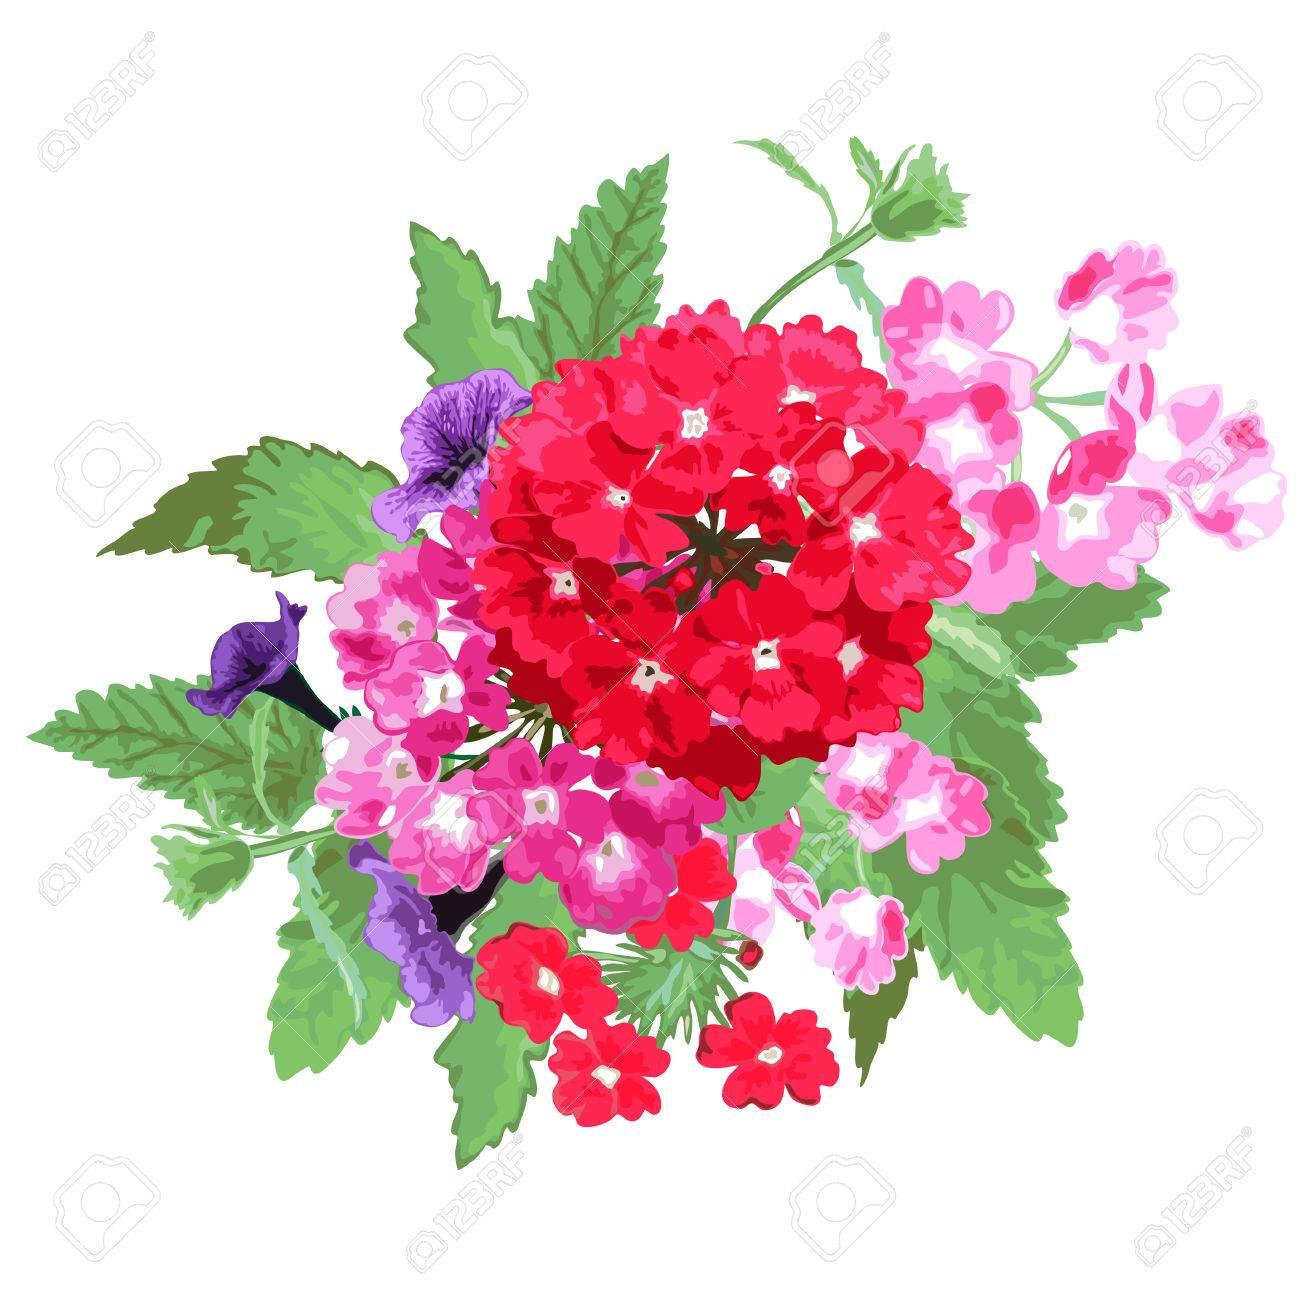 Elegant Bouquet With Verbena And Petunia Flowers, Design Element ...